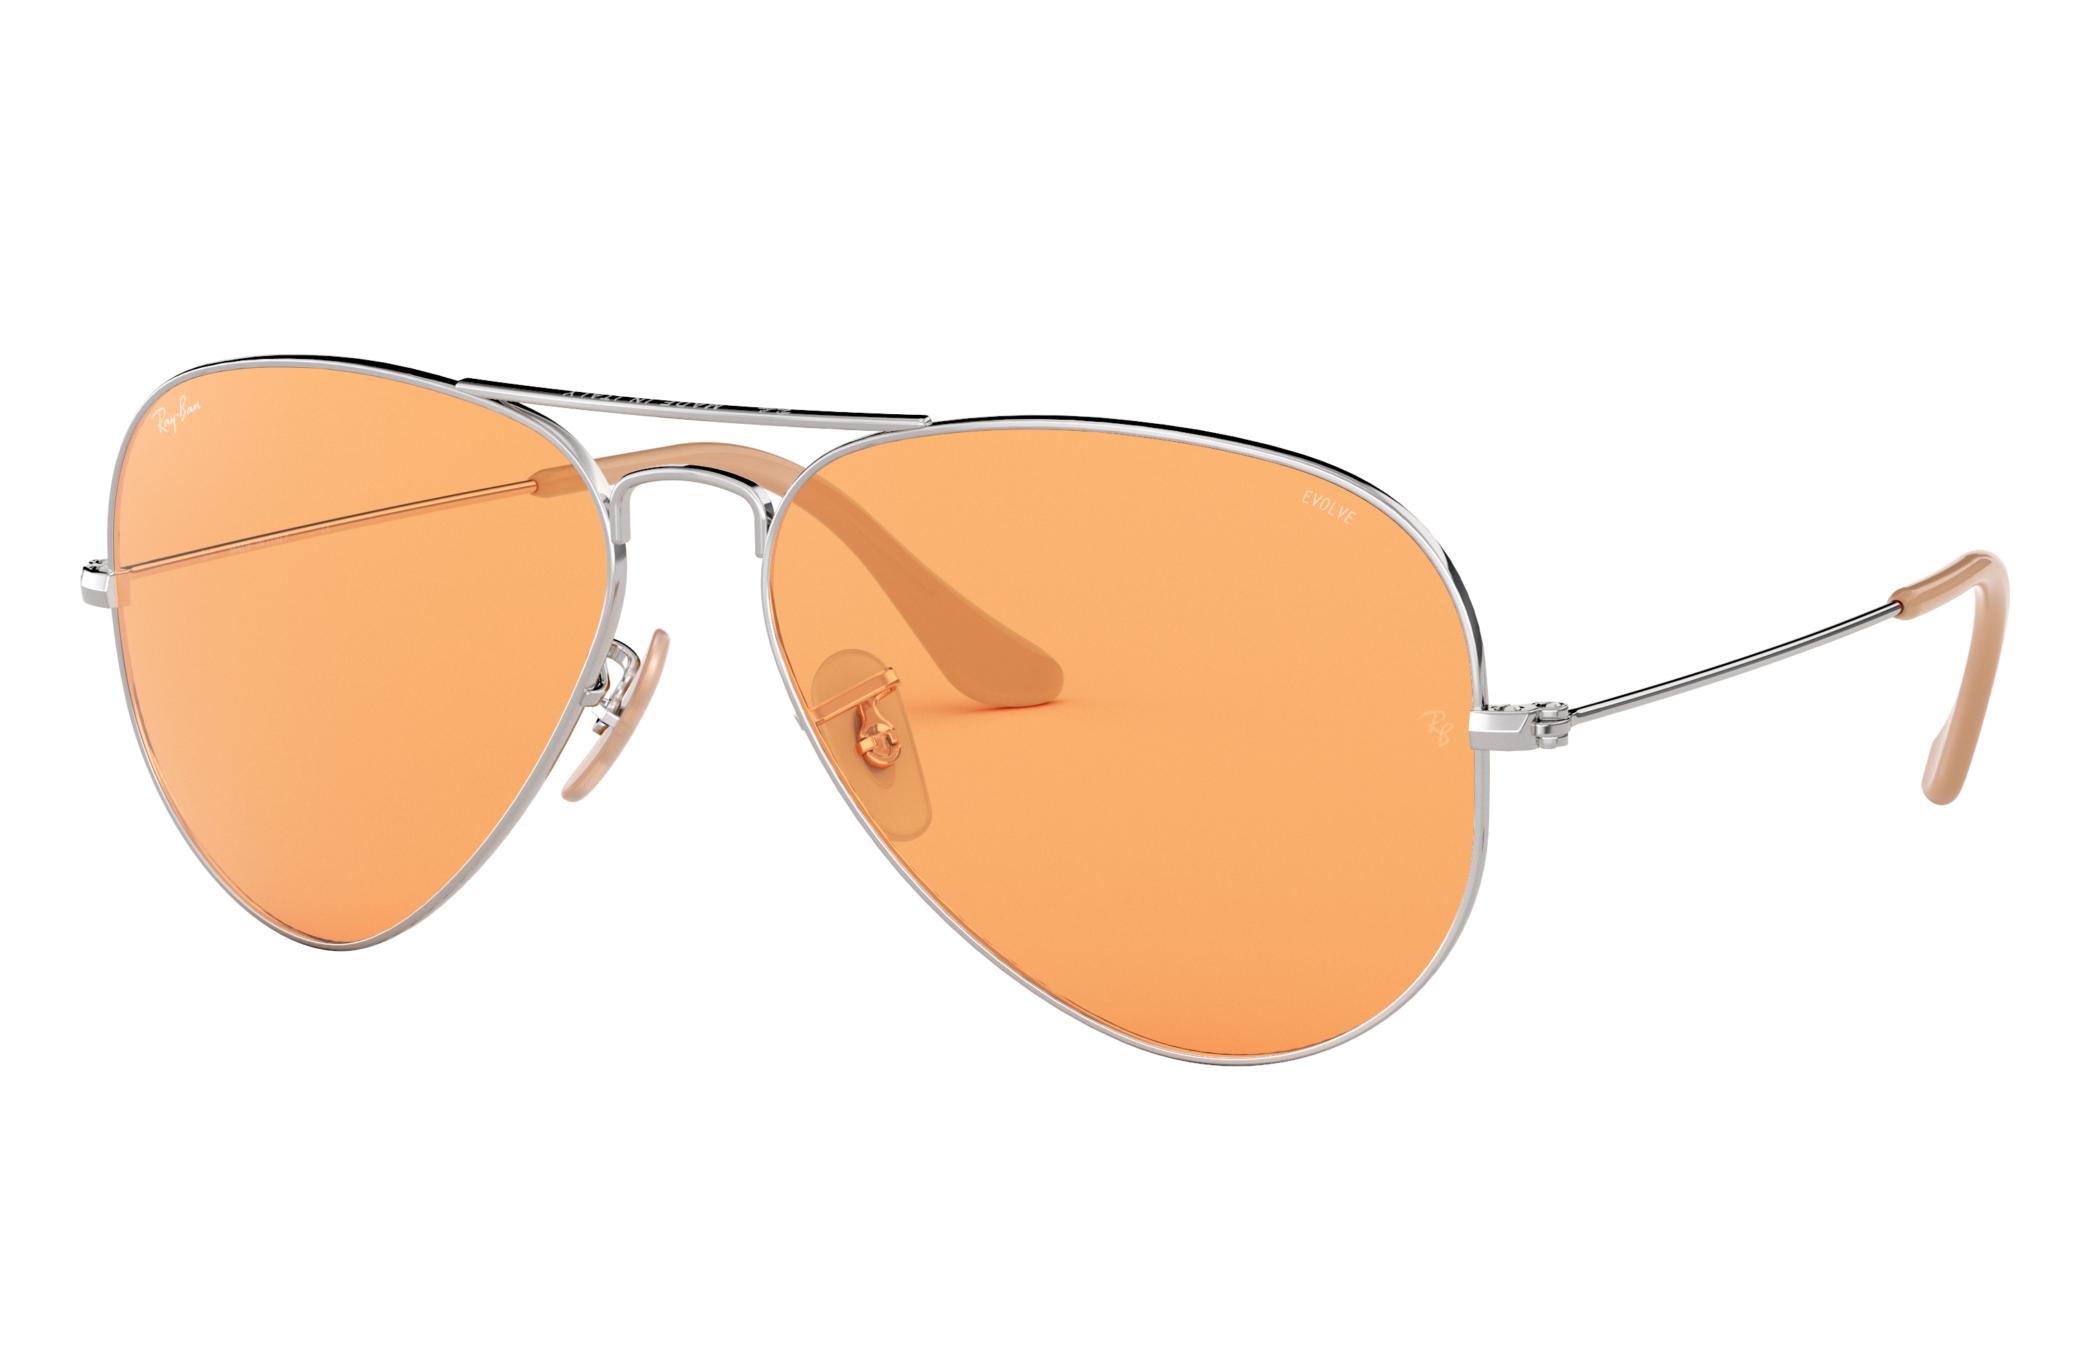 Ray-Ban Aviator Washed Evolve Silver, Orange Lenses - RB3025